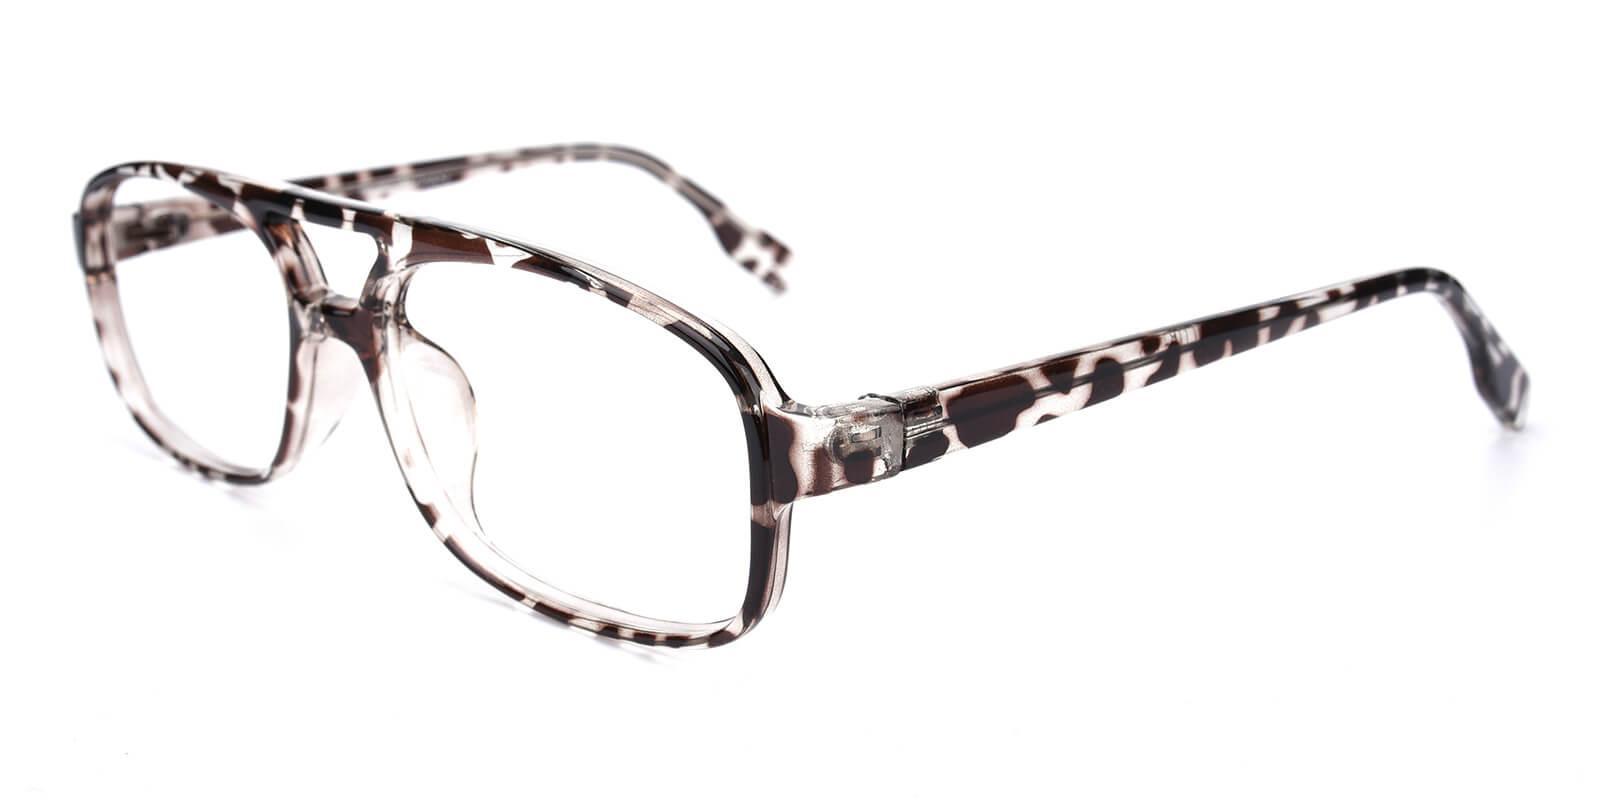 Messiany-Pattern-Rectangle-Plastic-Eyeglasses-additional1